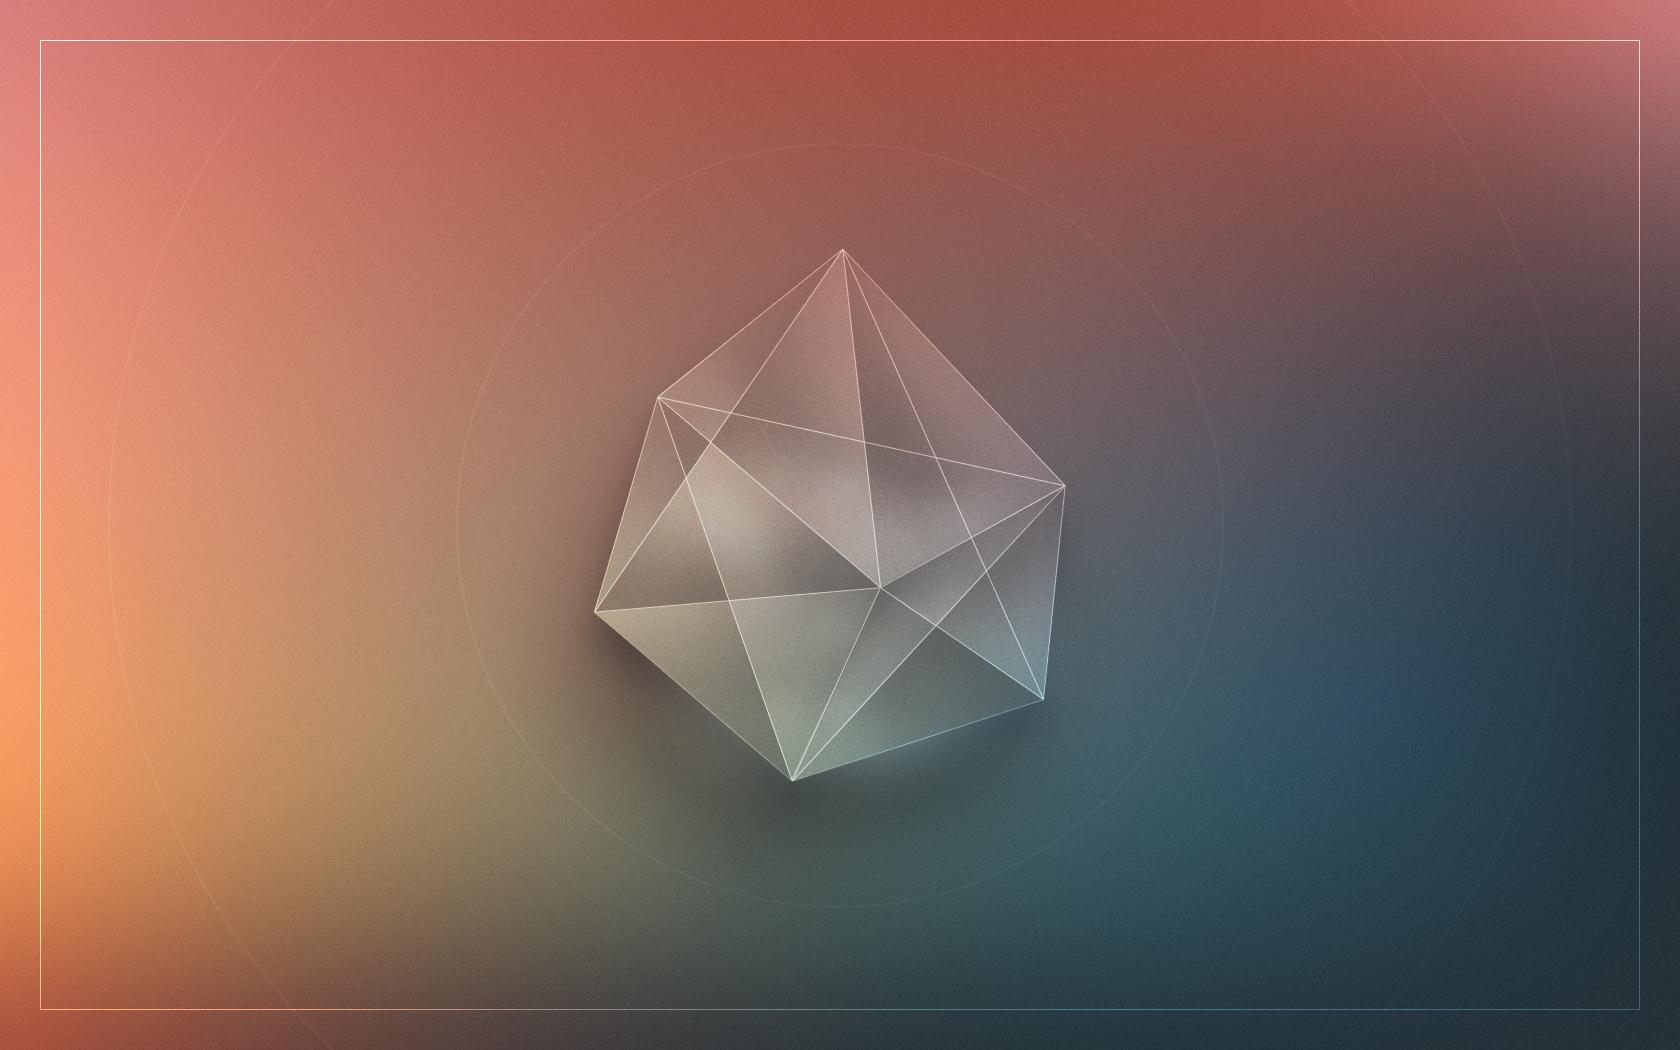 Crystal 1680x1050